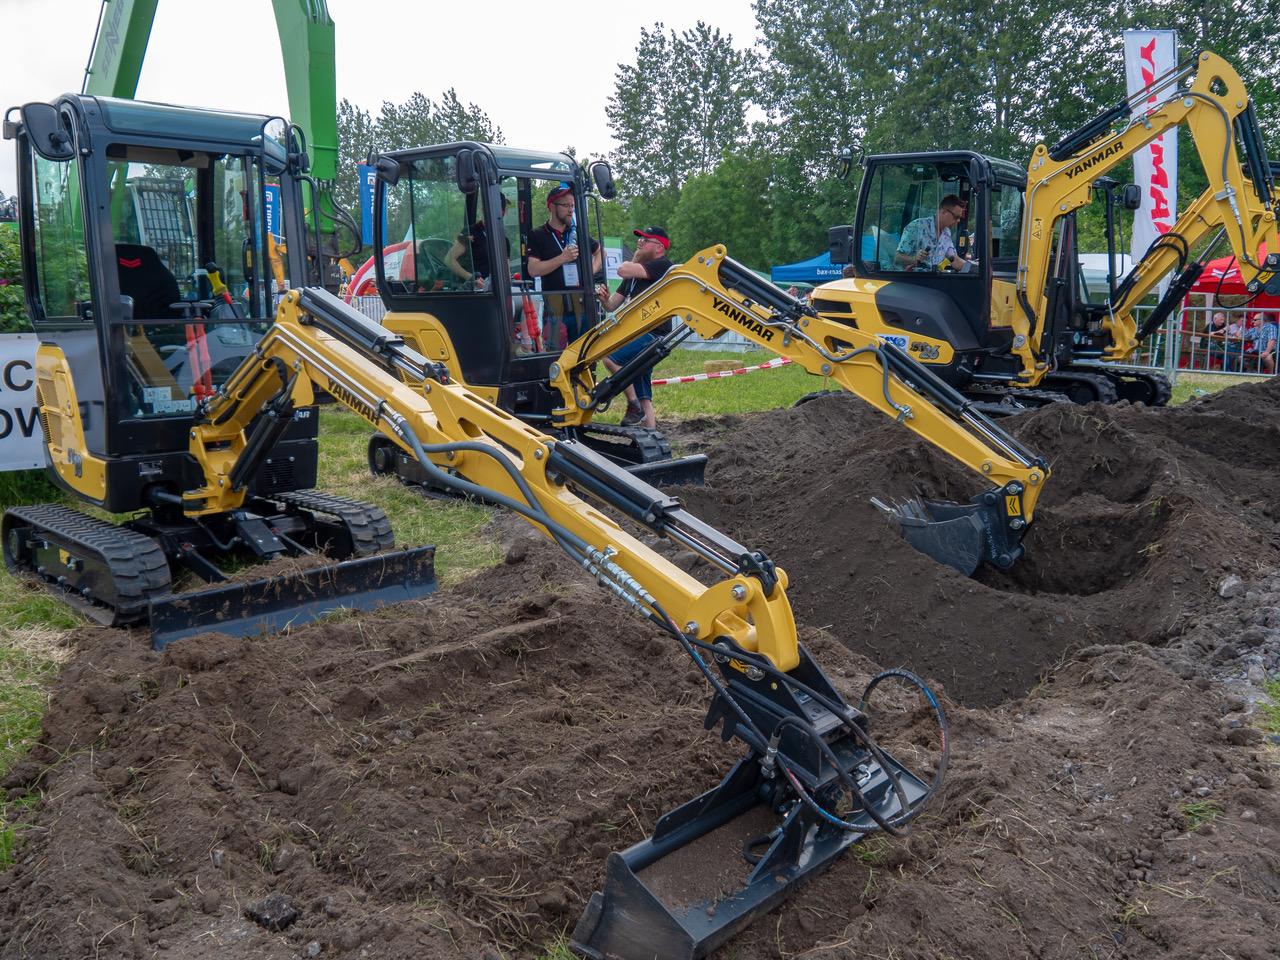 Yanmar CEE in mostra all'Erobocze Show 2019 - escavatore cingolato escavatore gommato escavatori cingolati escavatori gommati miniescavatore miniescavatori Yanmar CEE -Construction&Movimento Terra Notizie - MC5.0-Macchine Cantieri 1